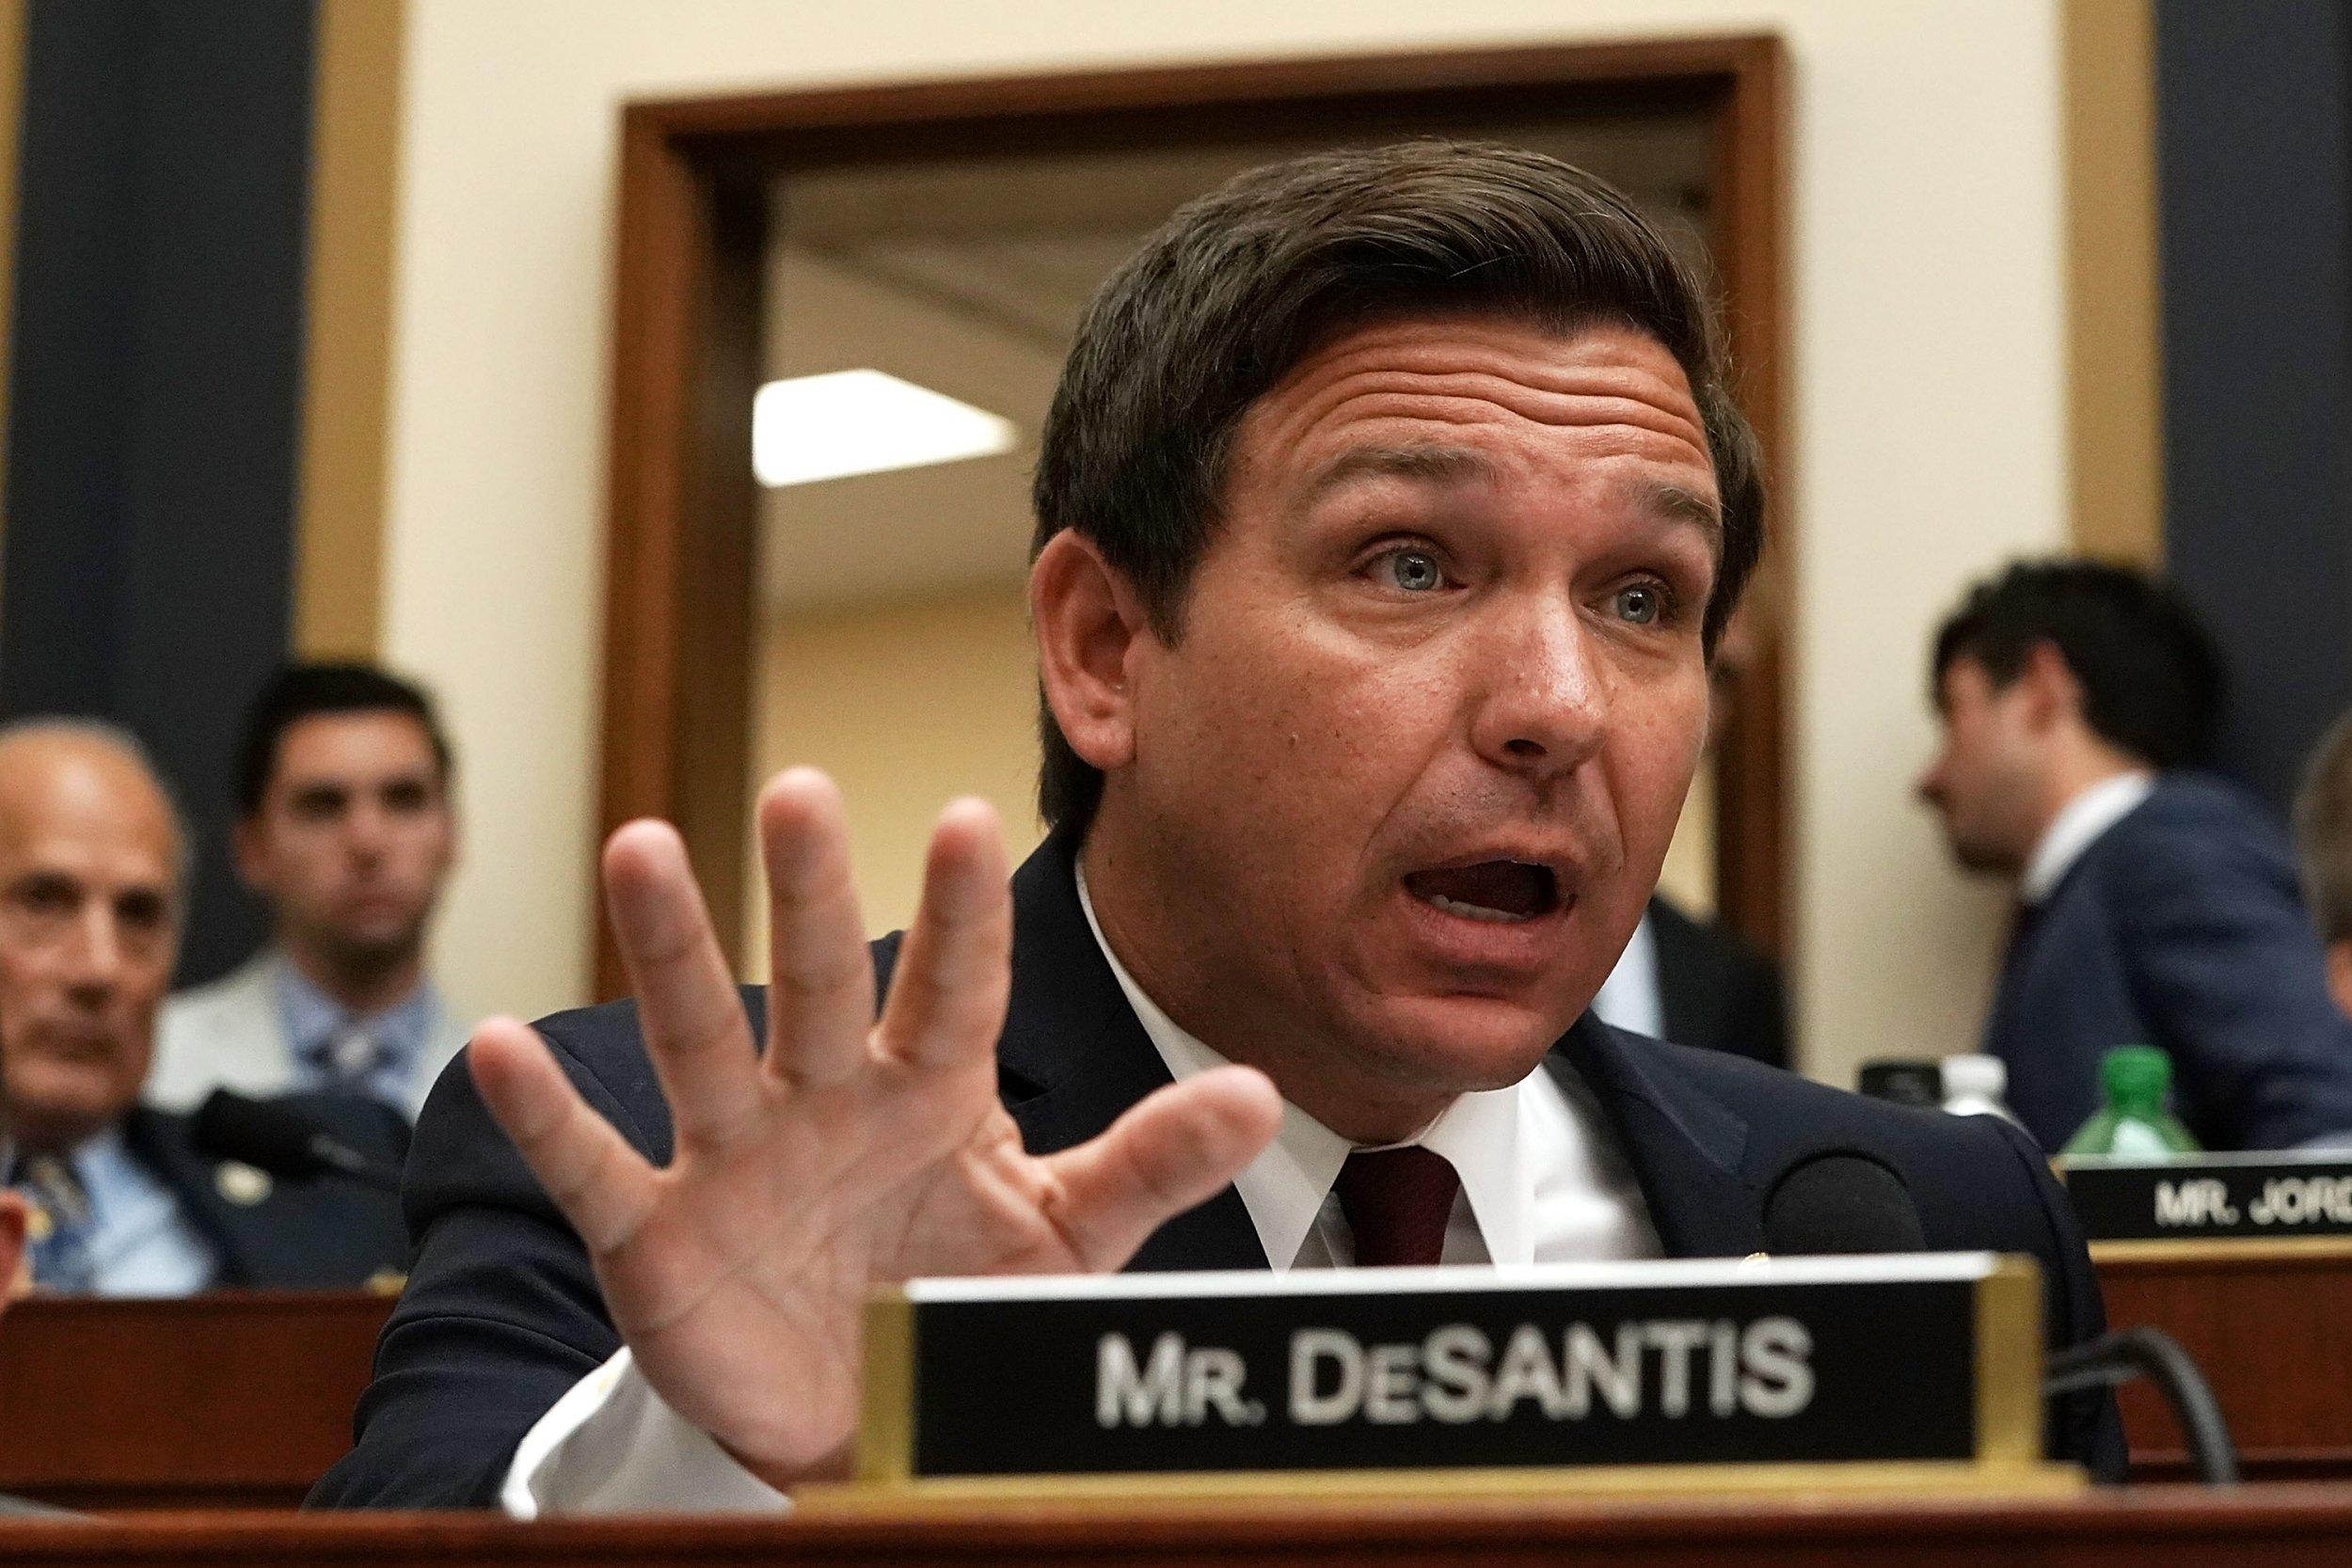 Florida governor candidate ron DeSantis